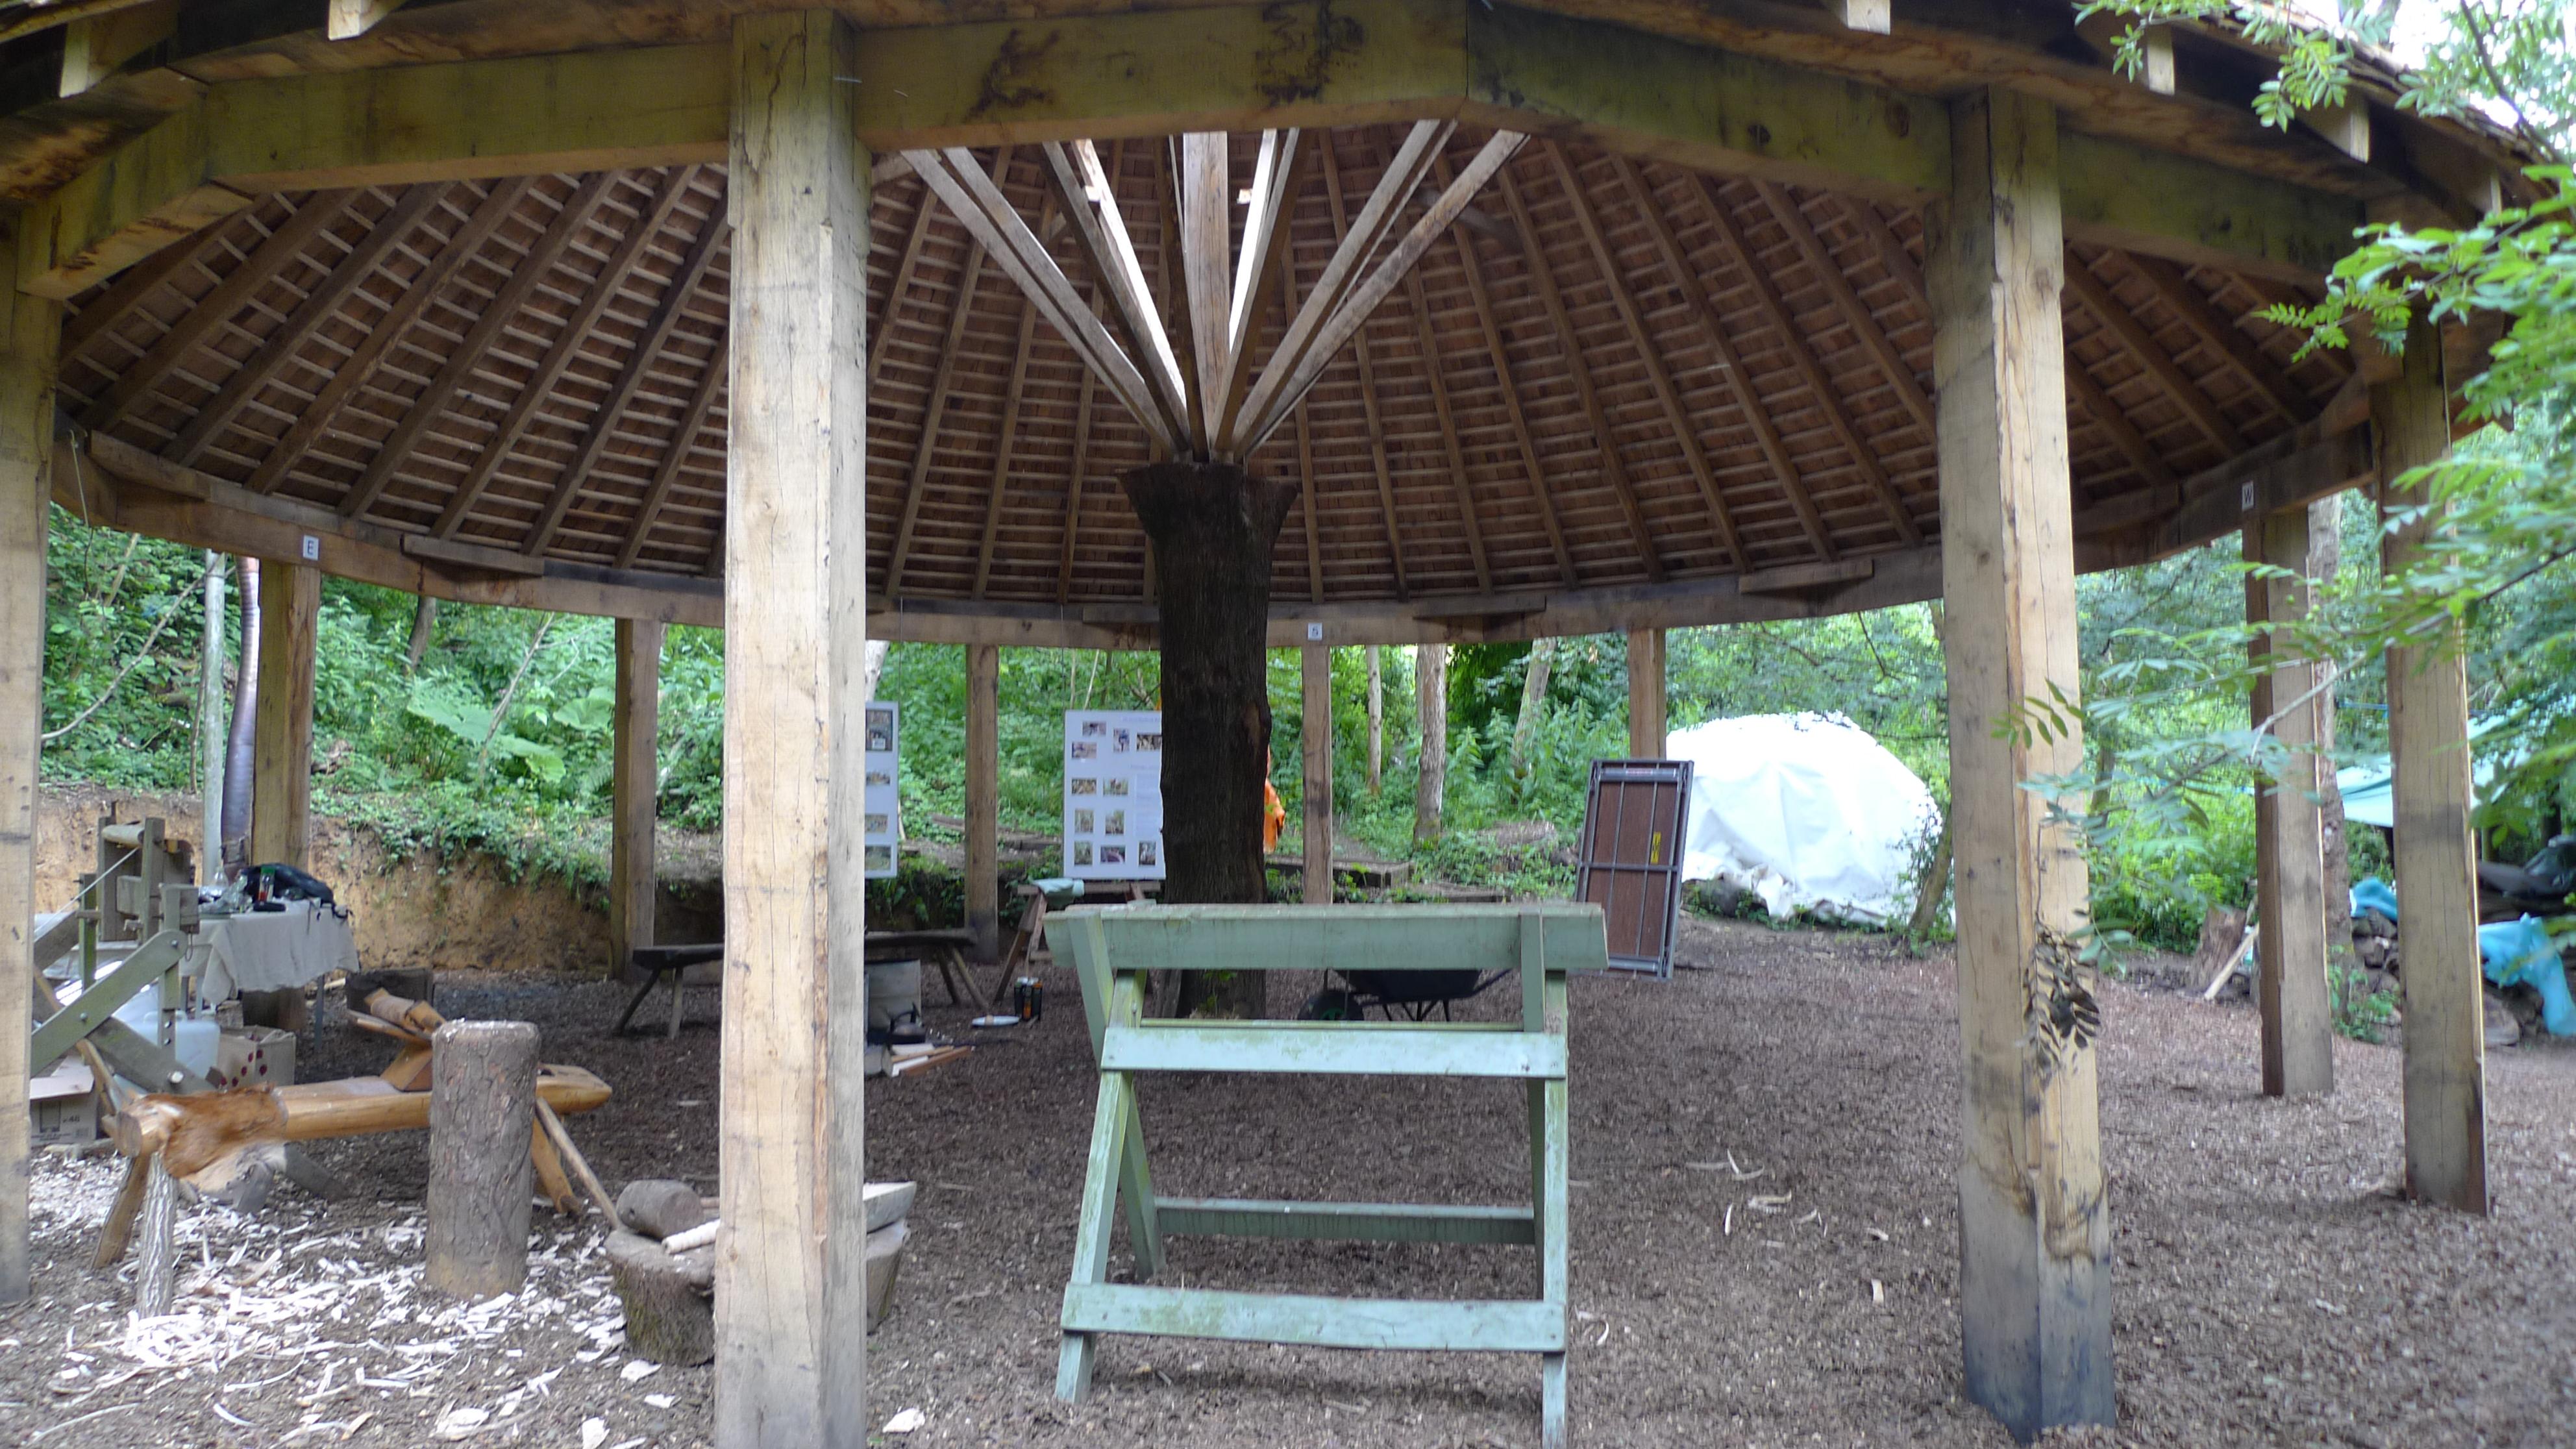 Ruskin Mill Green Woodworking Shelter Oak Timber Framing